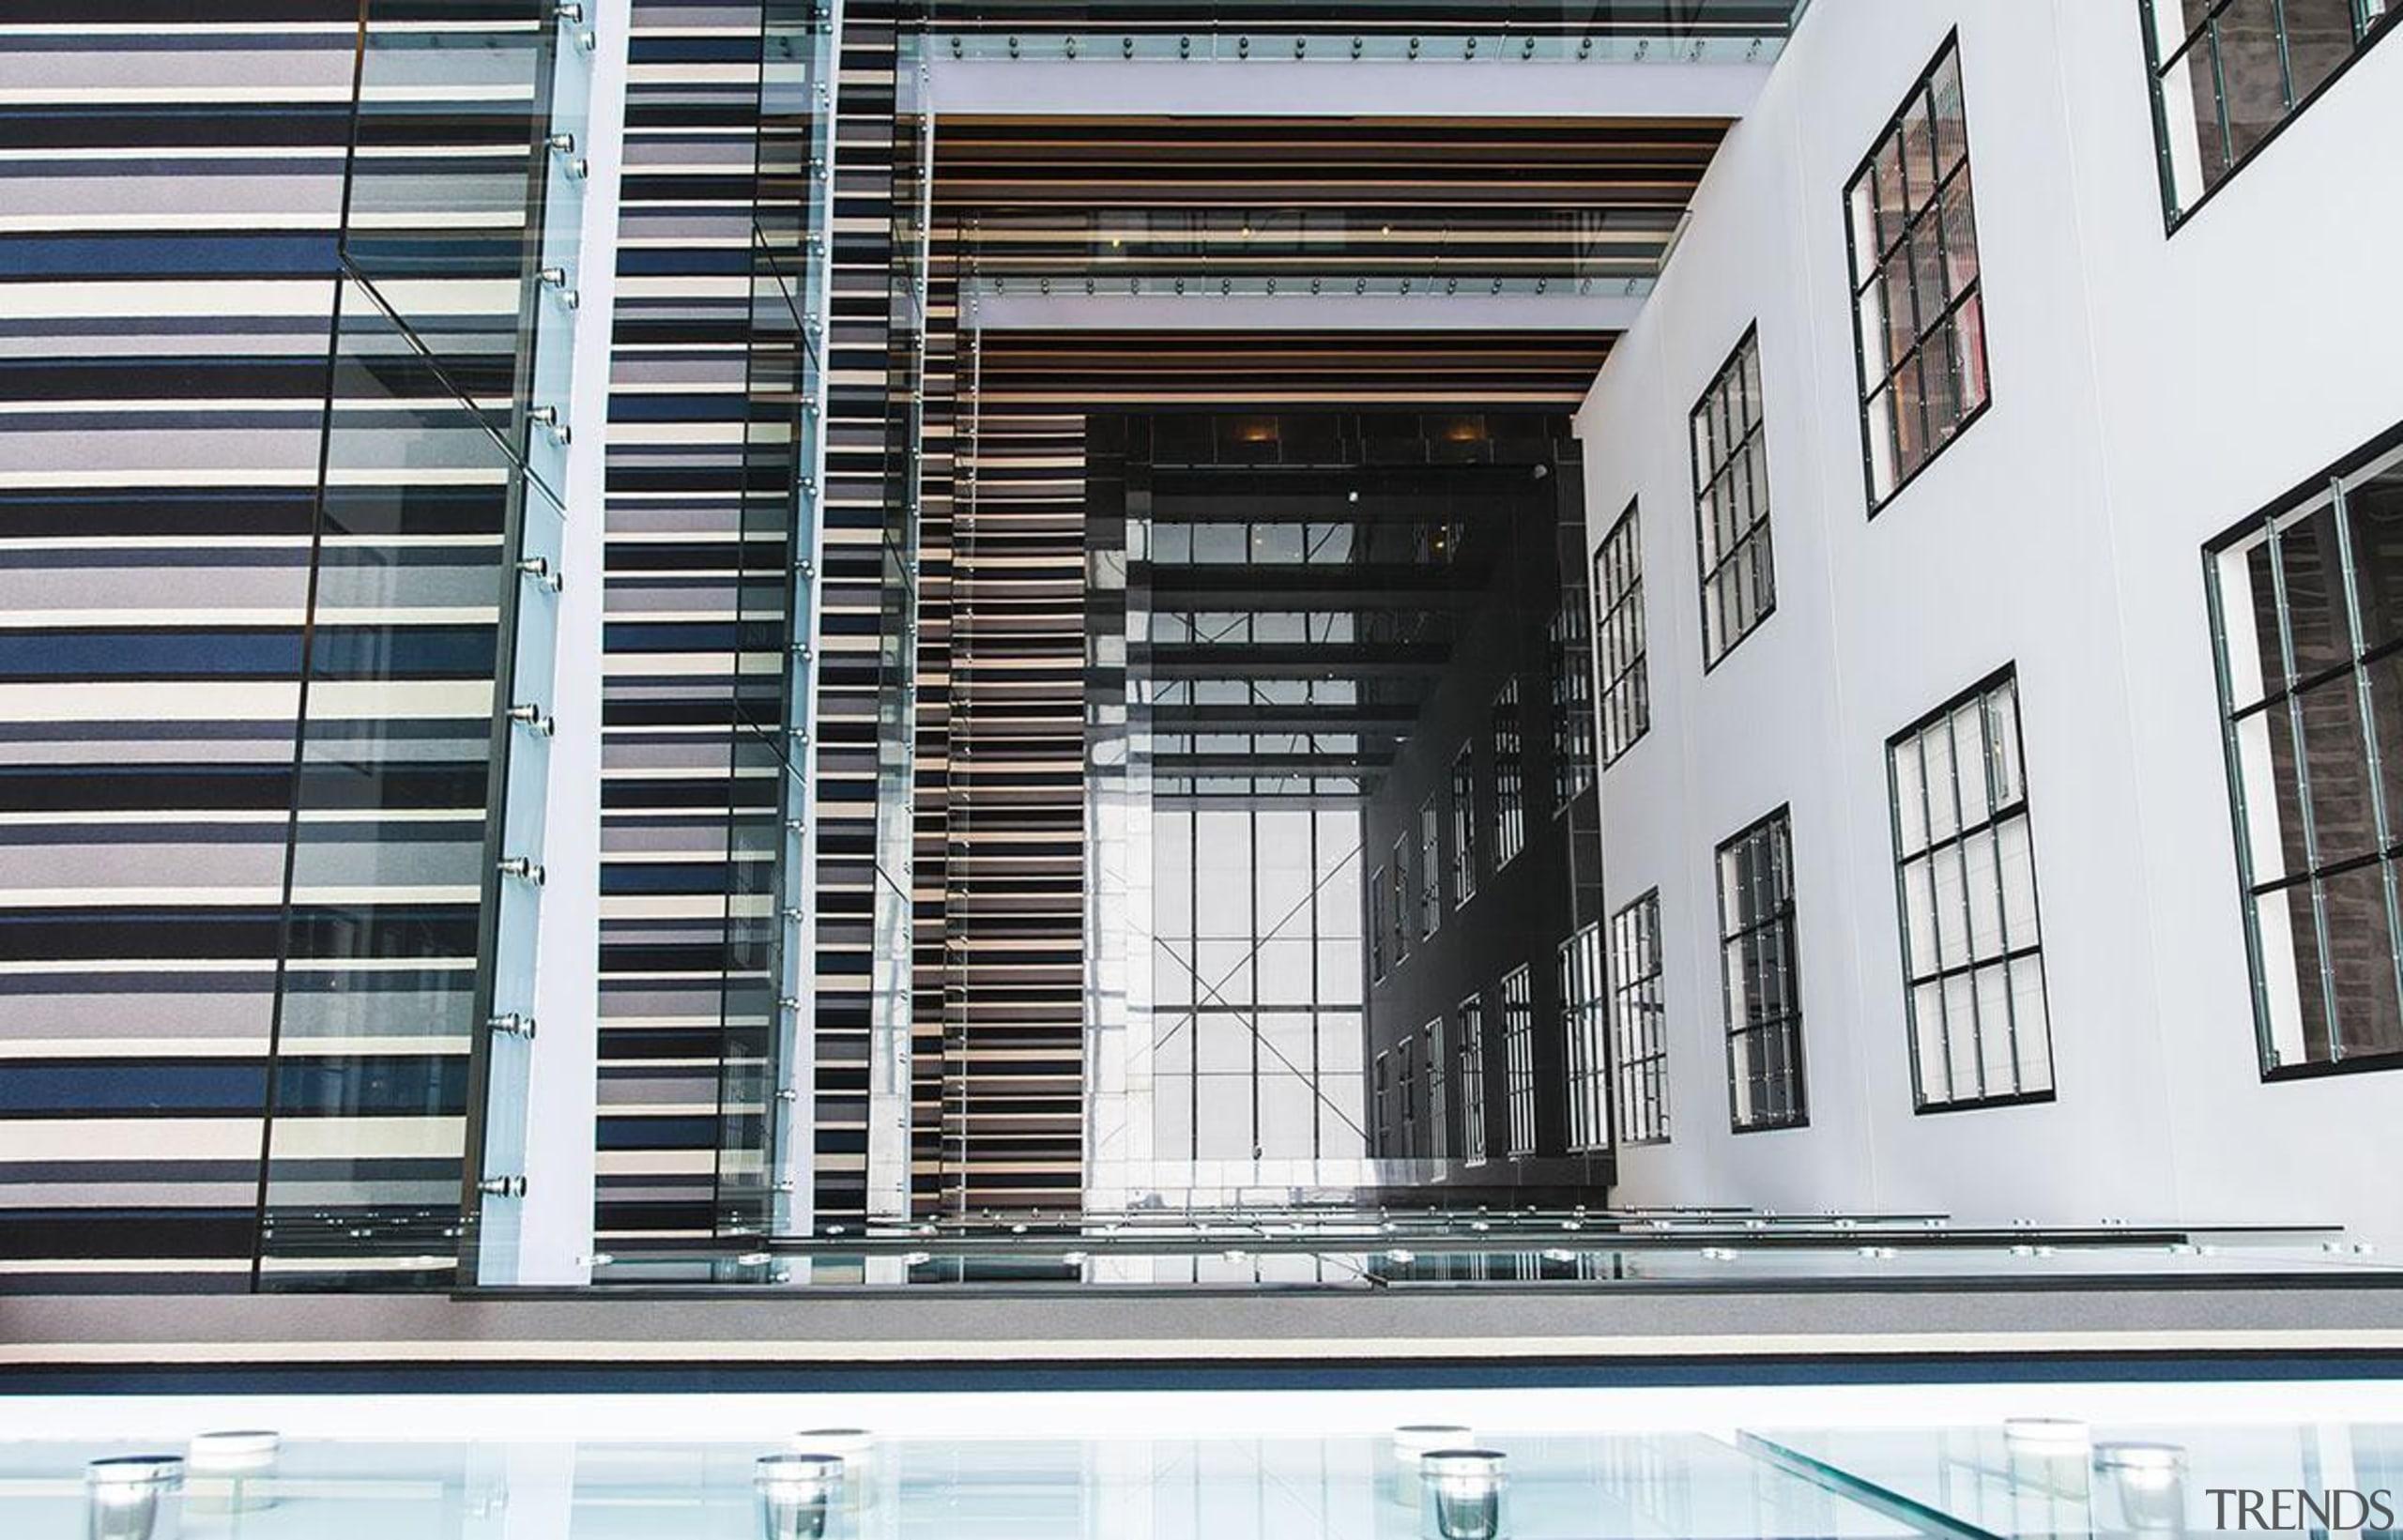 NOMINEE132 Vincent Street (2 of 4) - Hawkins architecture, building, condominium, daylighting, facade, glass, window, white, black